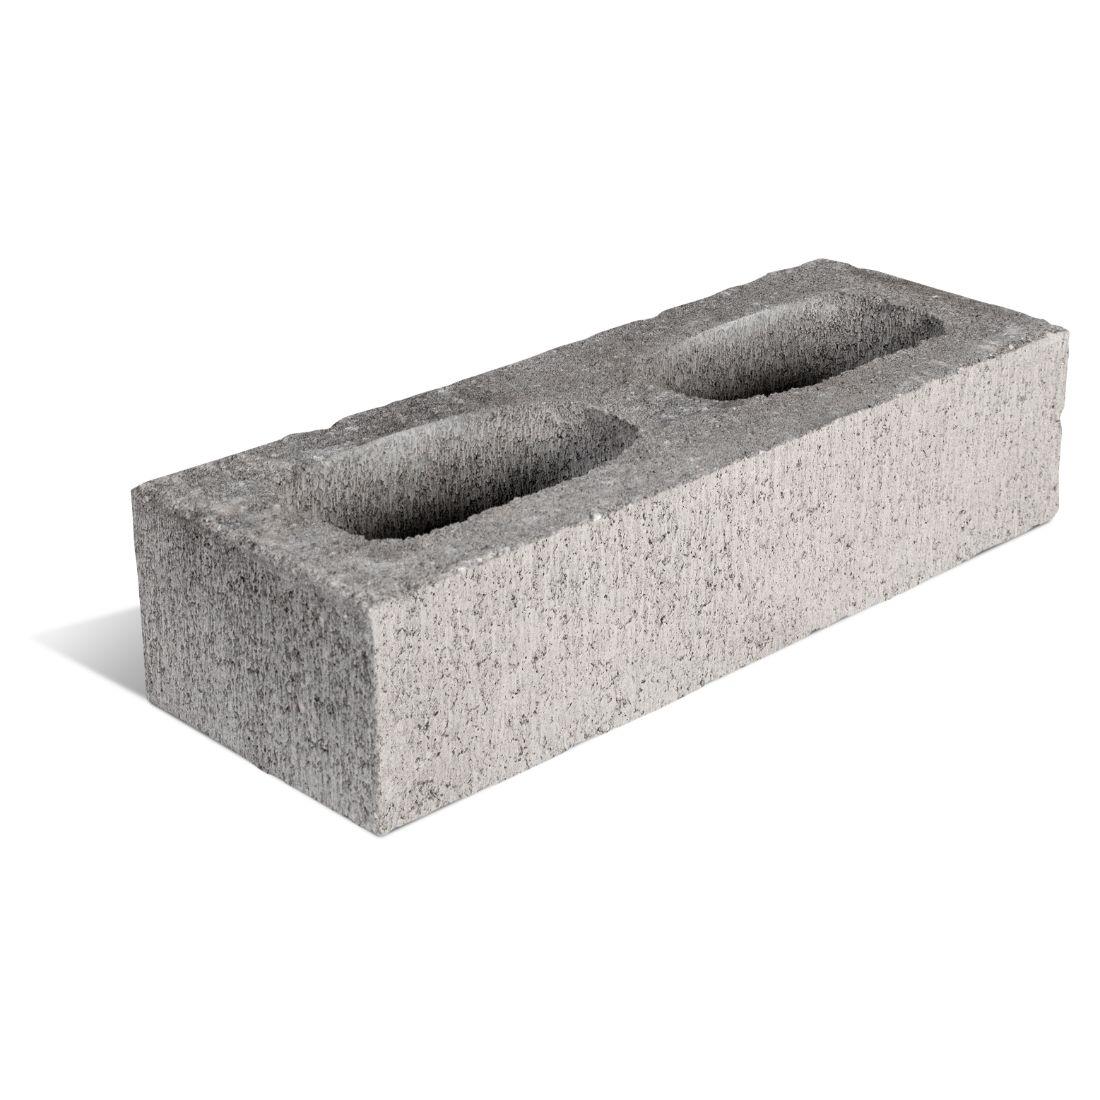 Block Plain Both Ends 15 Series 390 x 140 x 190mm 15.04